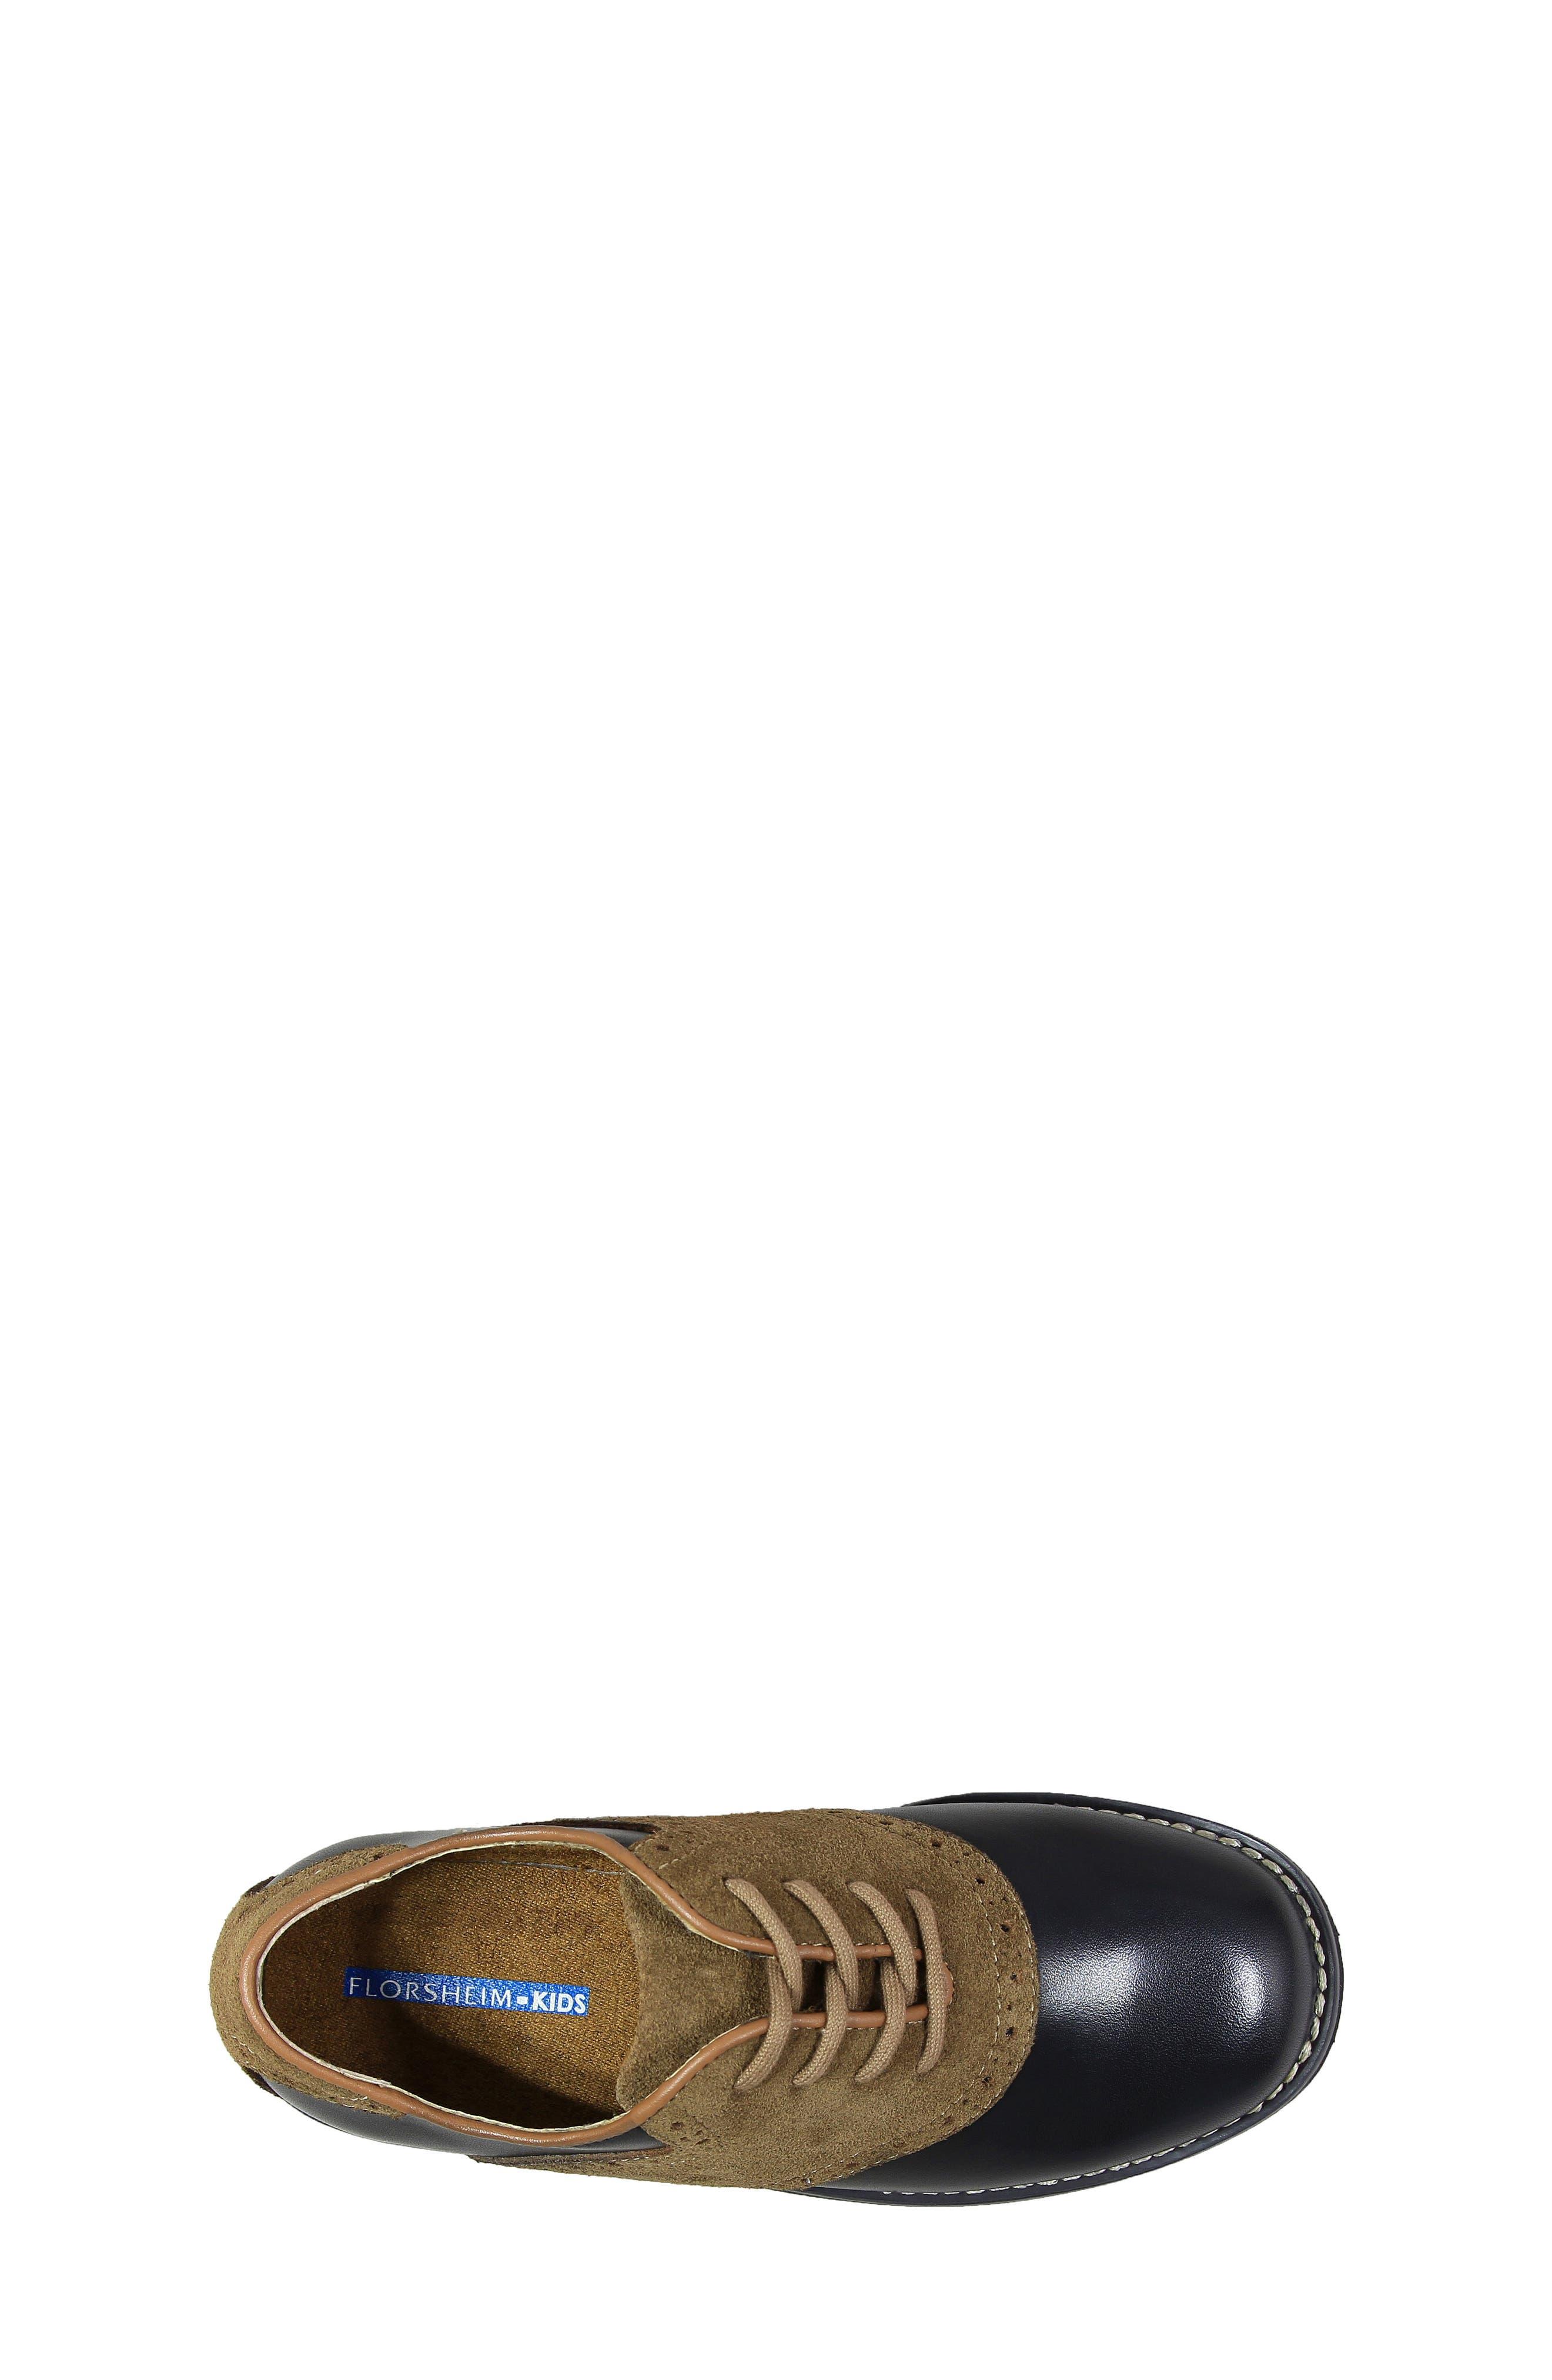 FLORSHEIM, 'Kennett Jr. II' Saddle Shoe, Alternate thumbnail 4, color, SMOOTH BLACK W/ MOCHA SUEDE